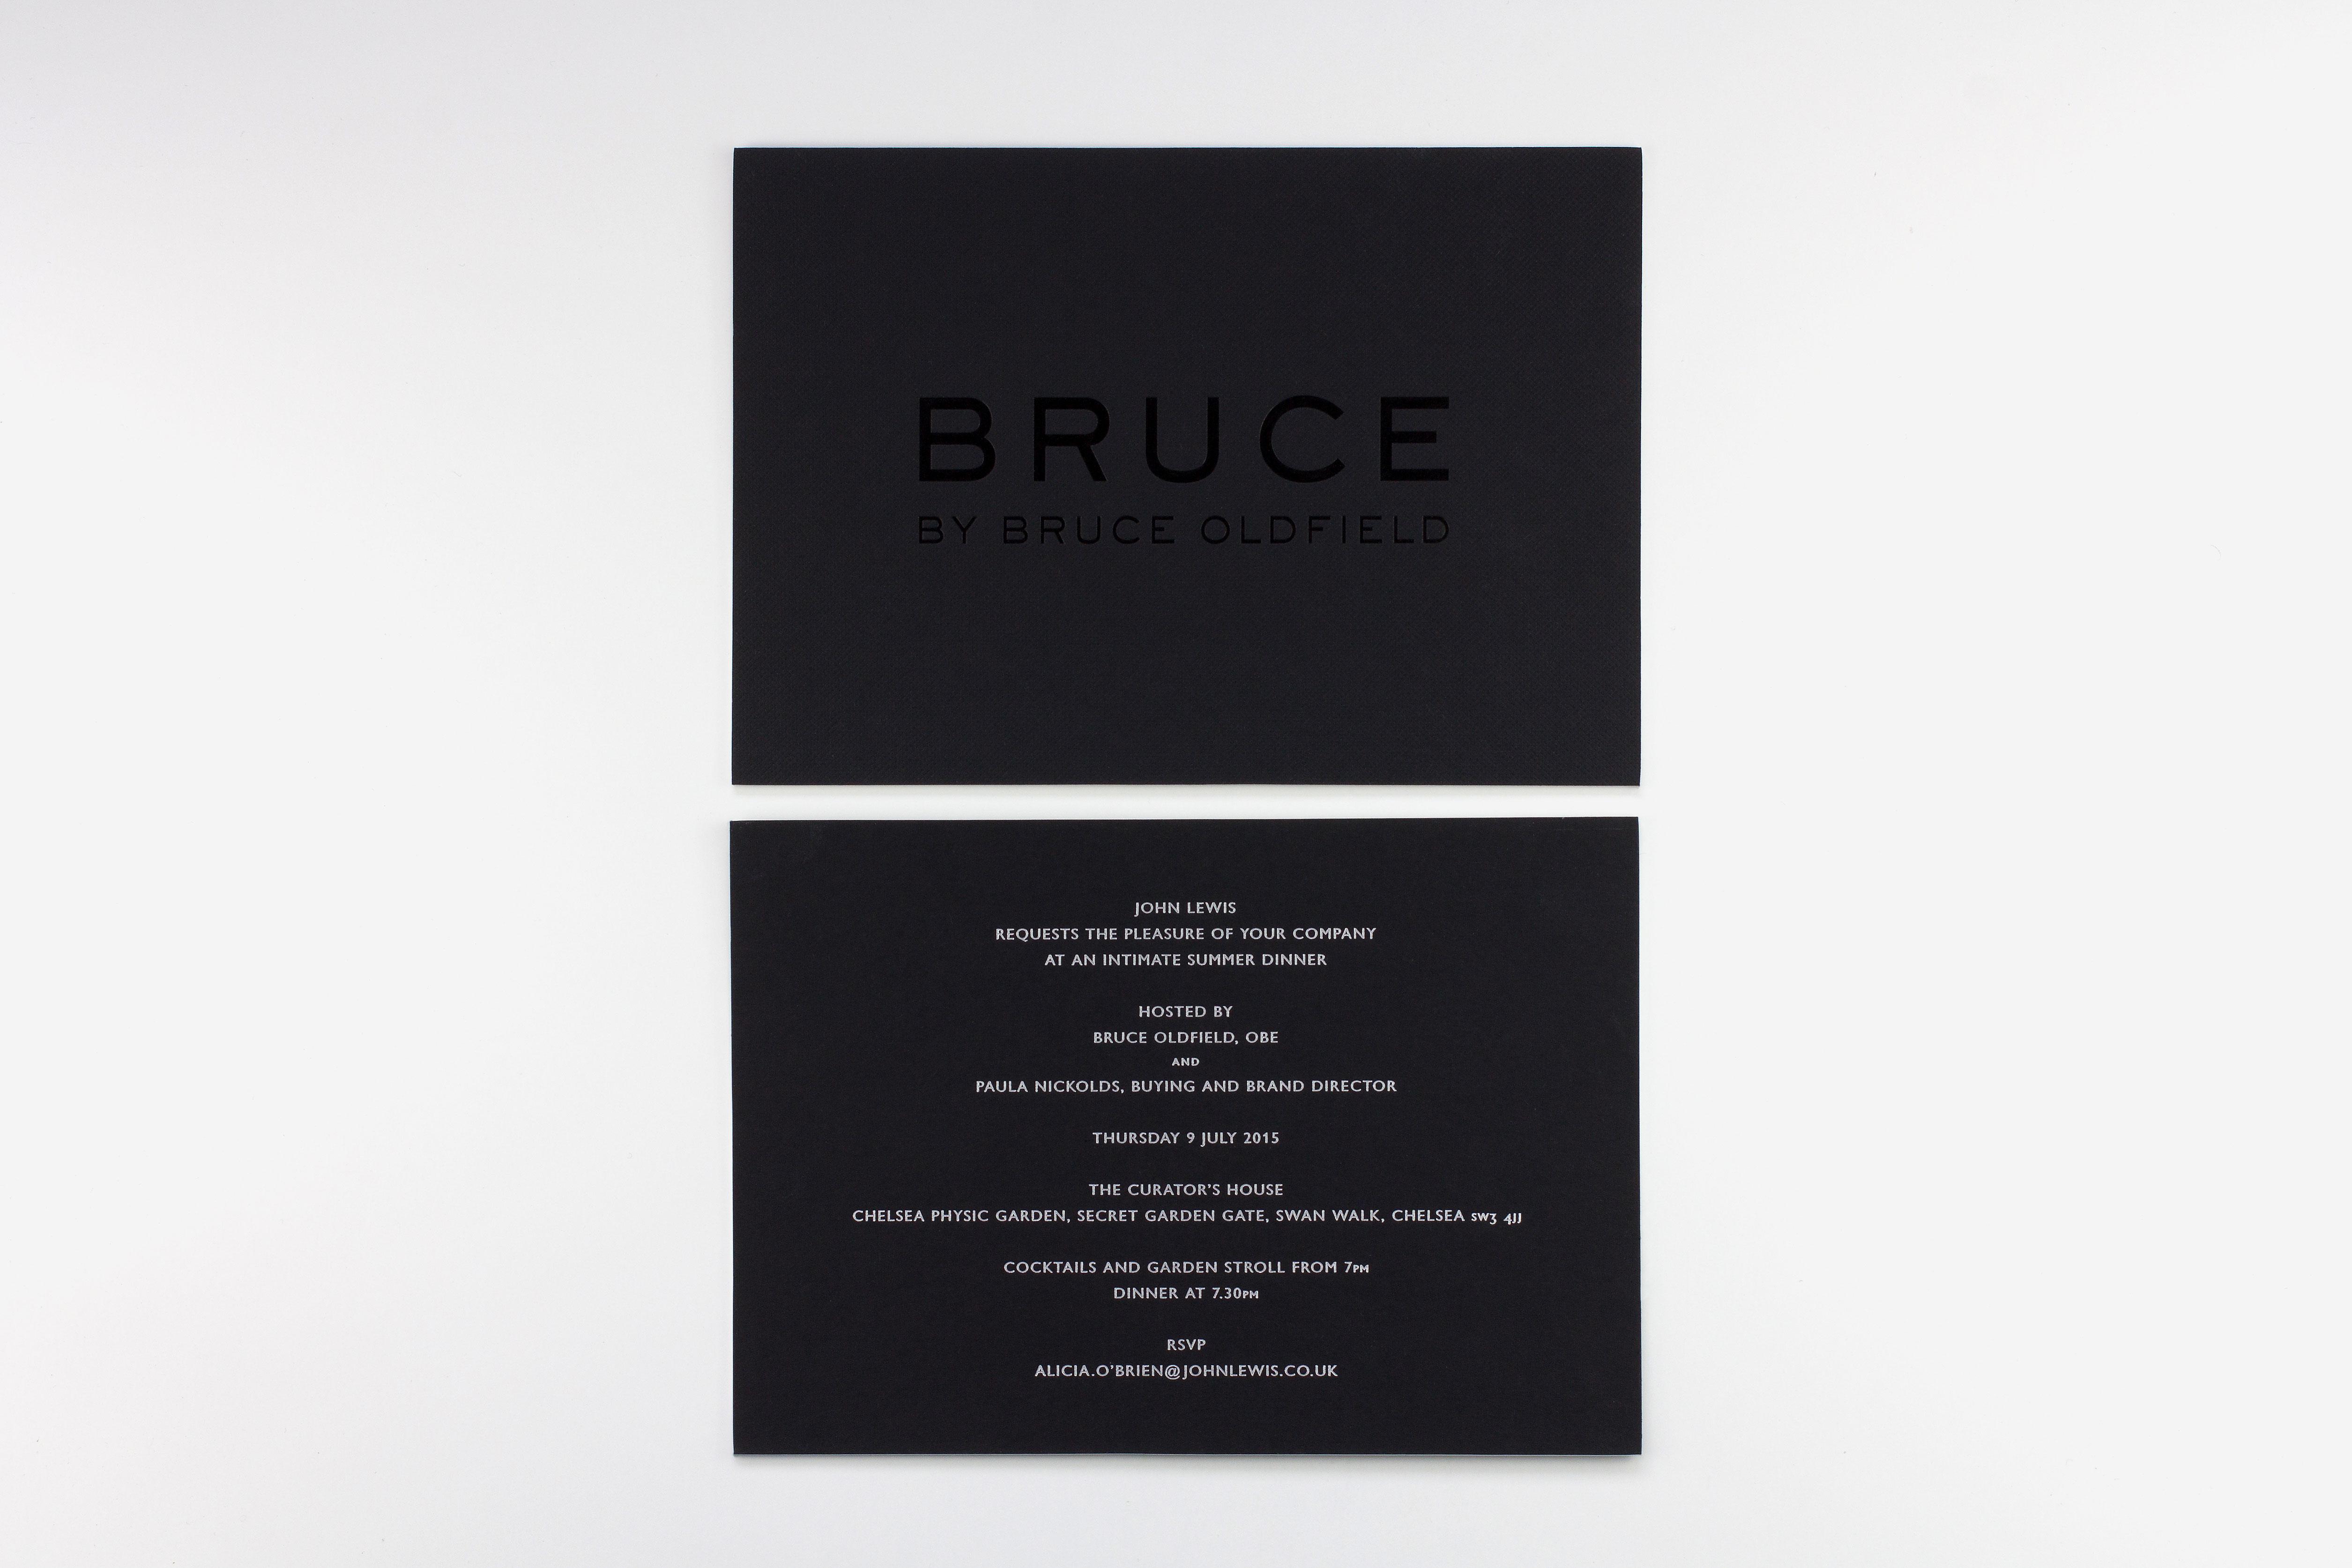 JL_Bruce_invitation